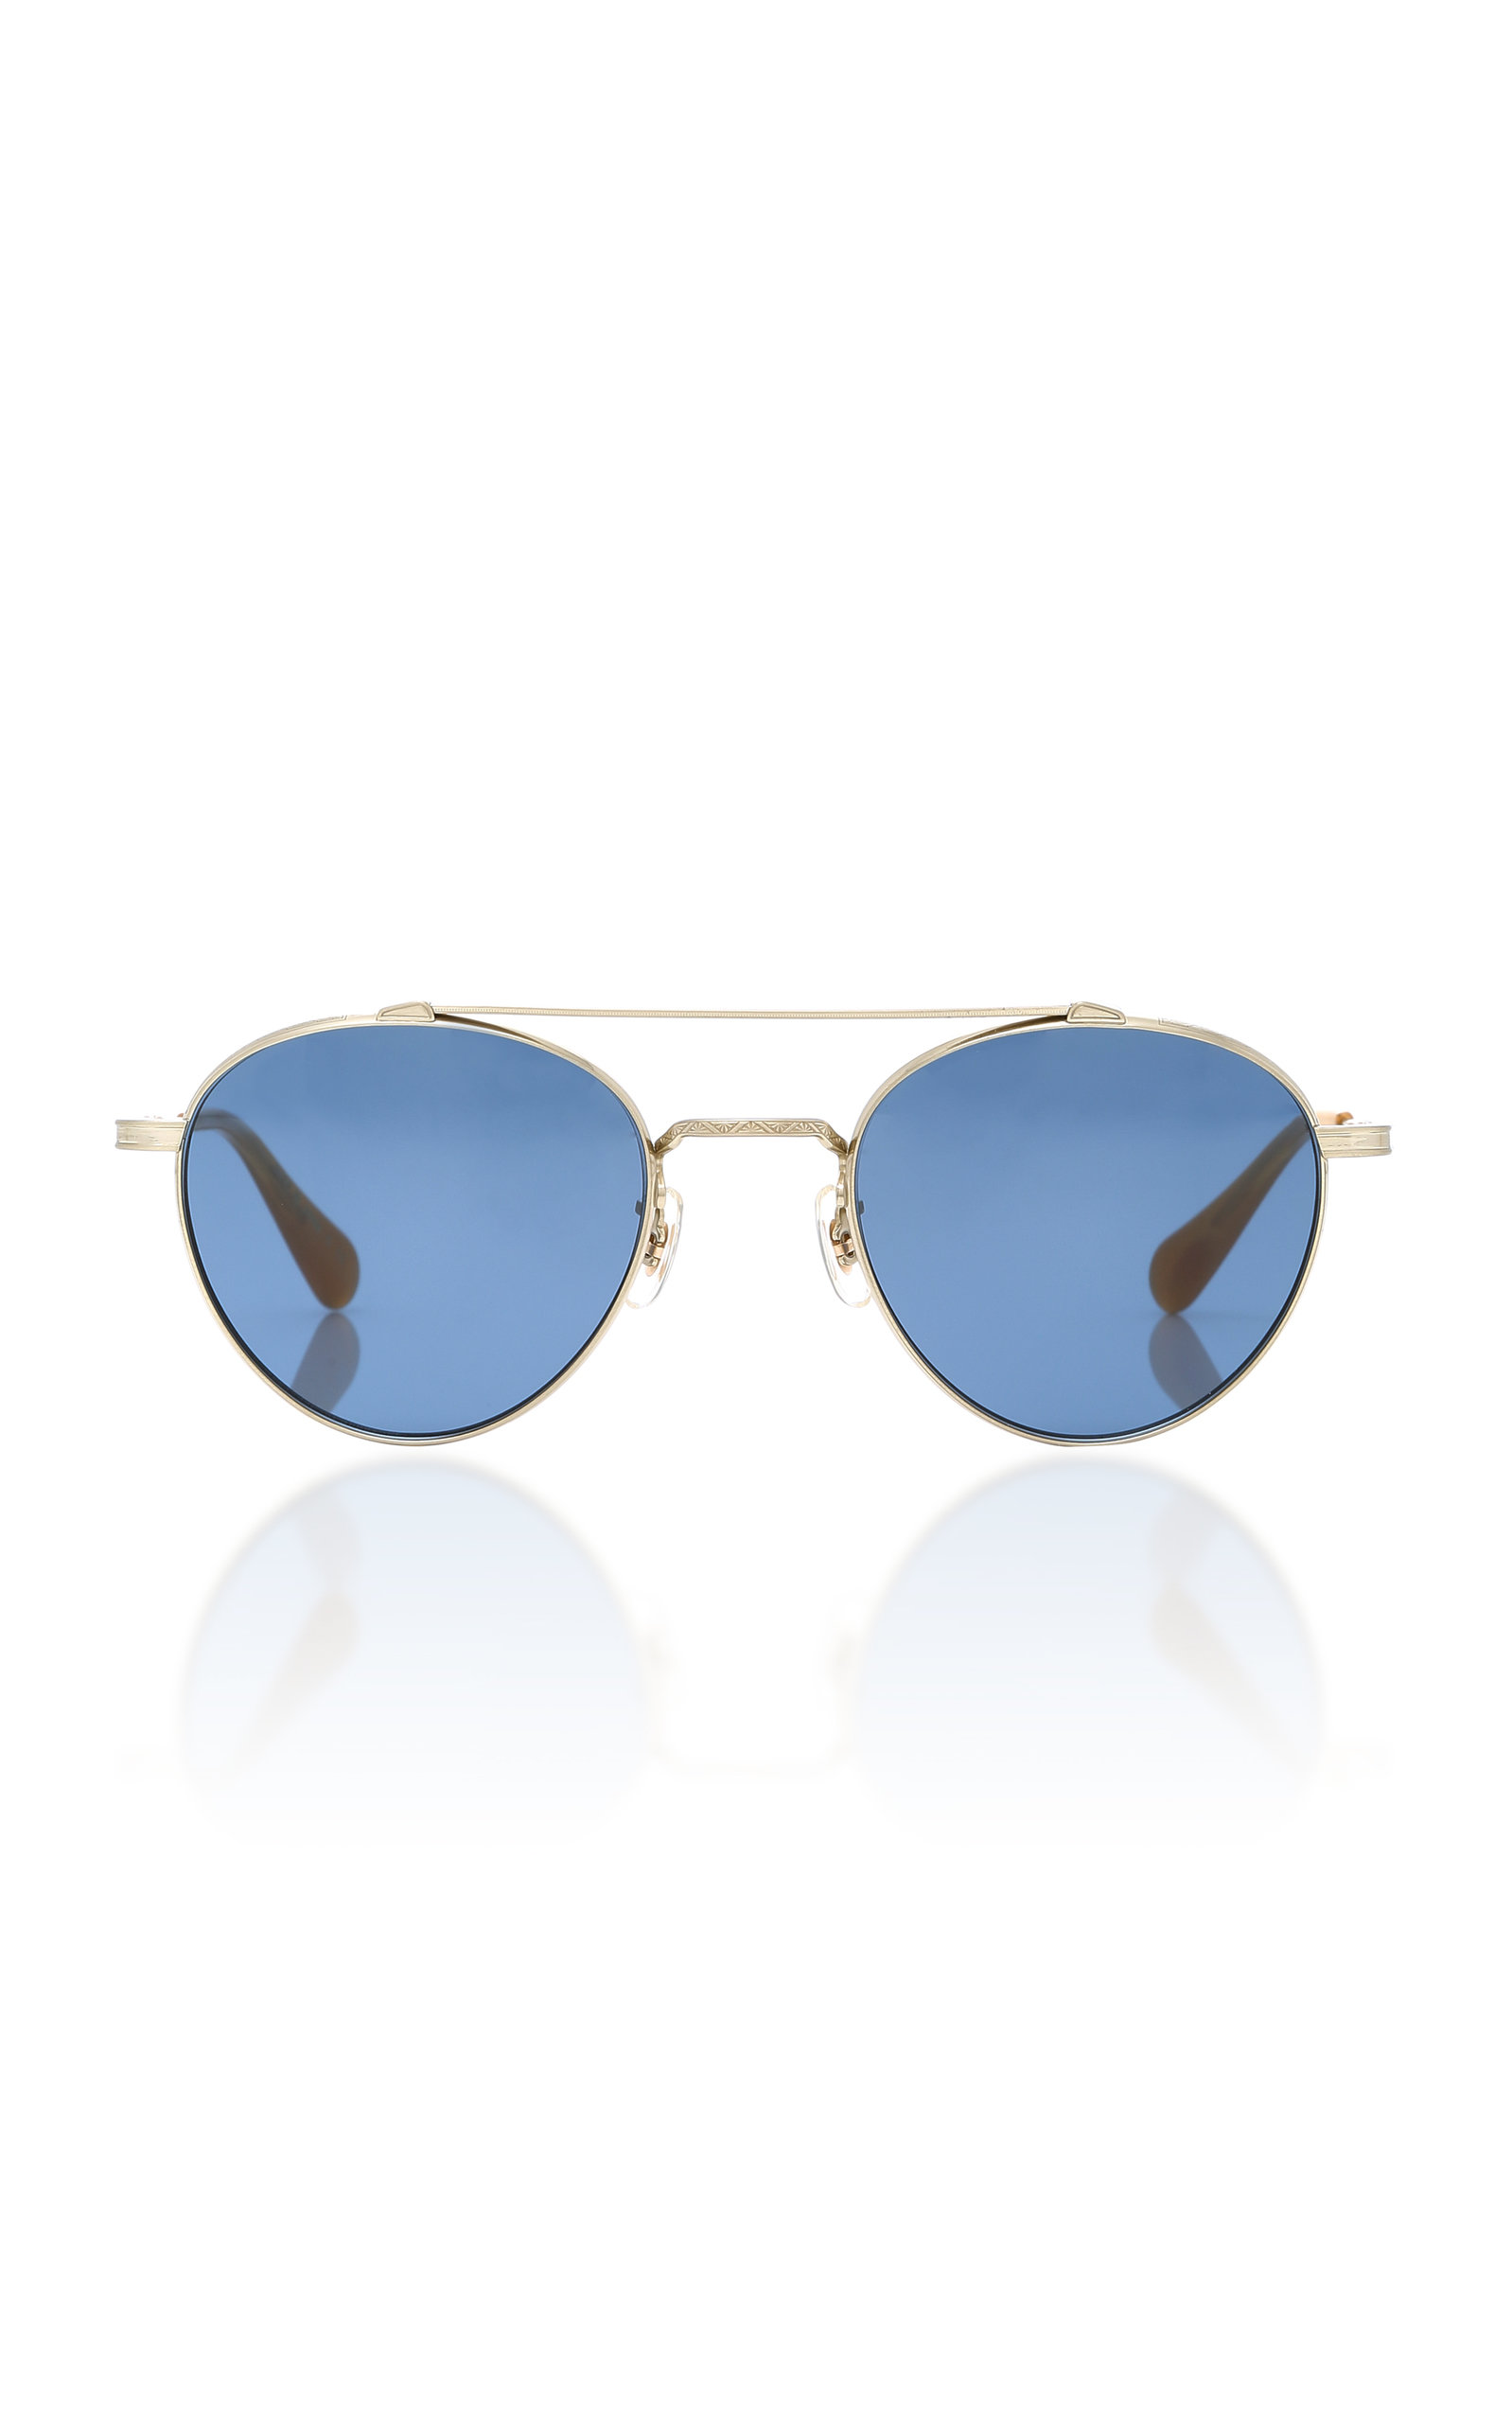 e247e31d6accc Oliver PeoplesWatts Round Aviator Sunglasses. CLOSE. Loading